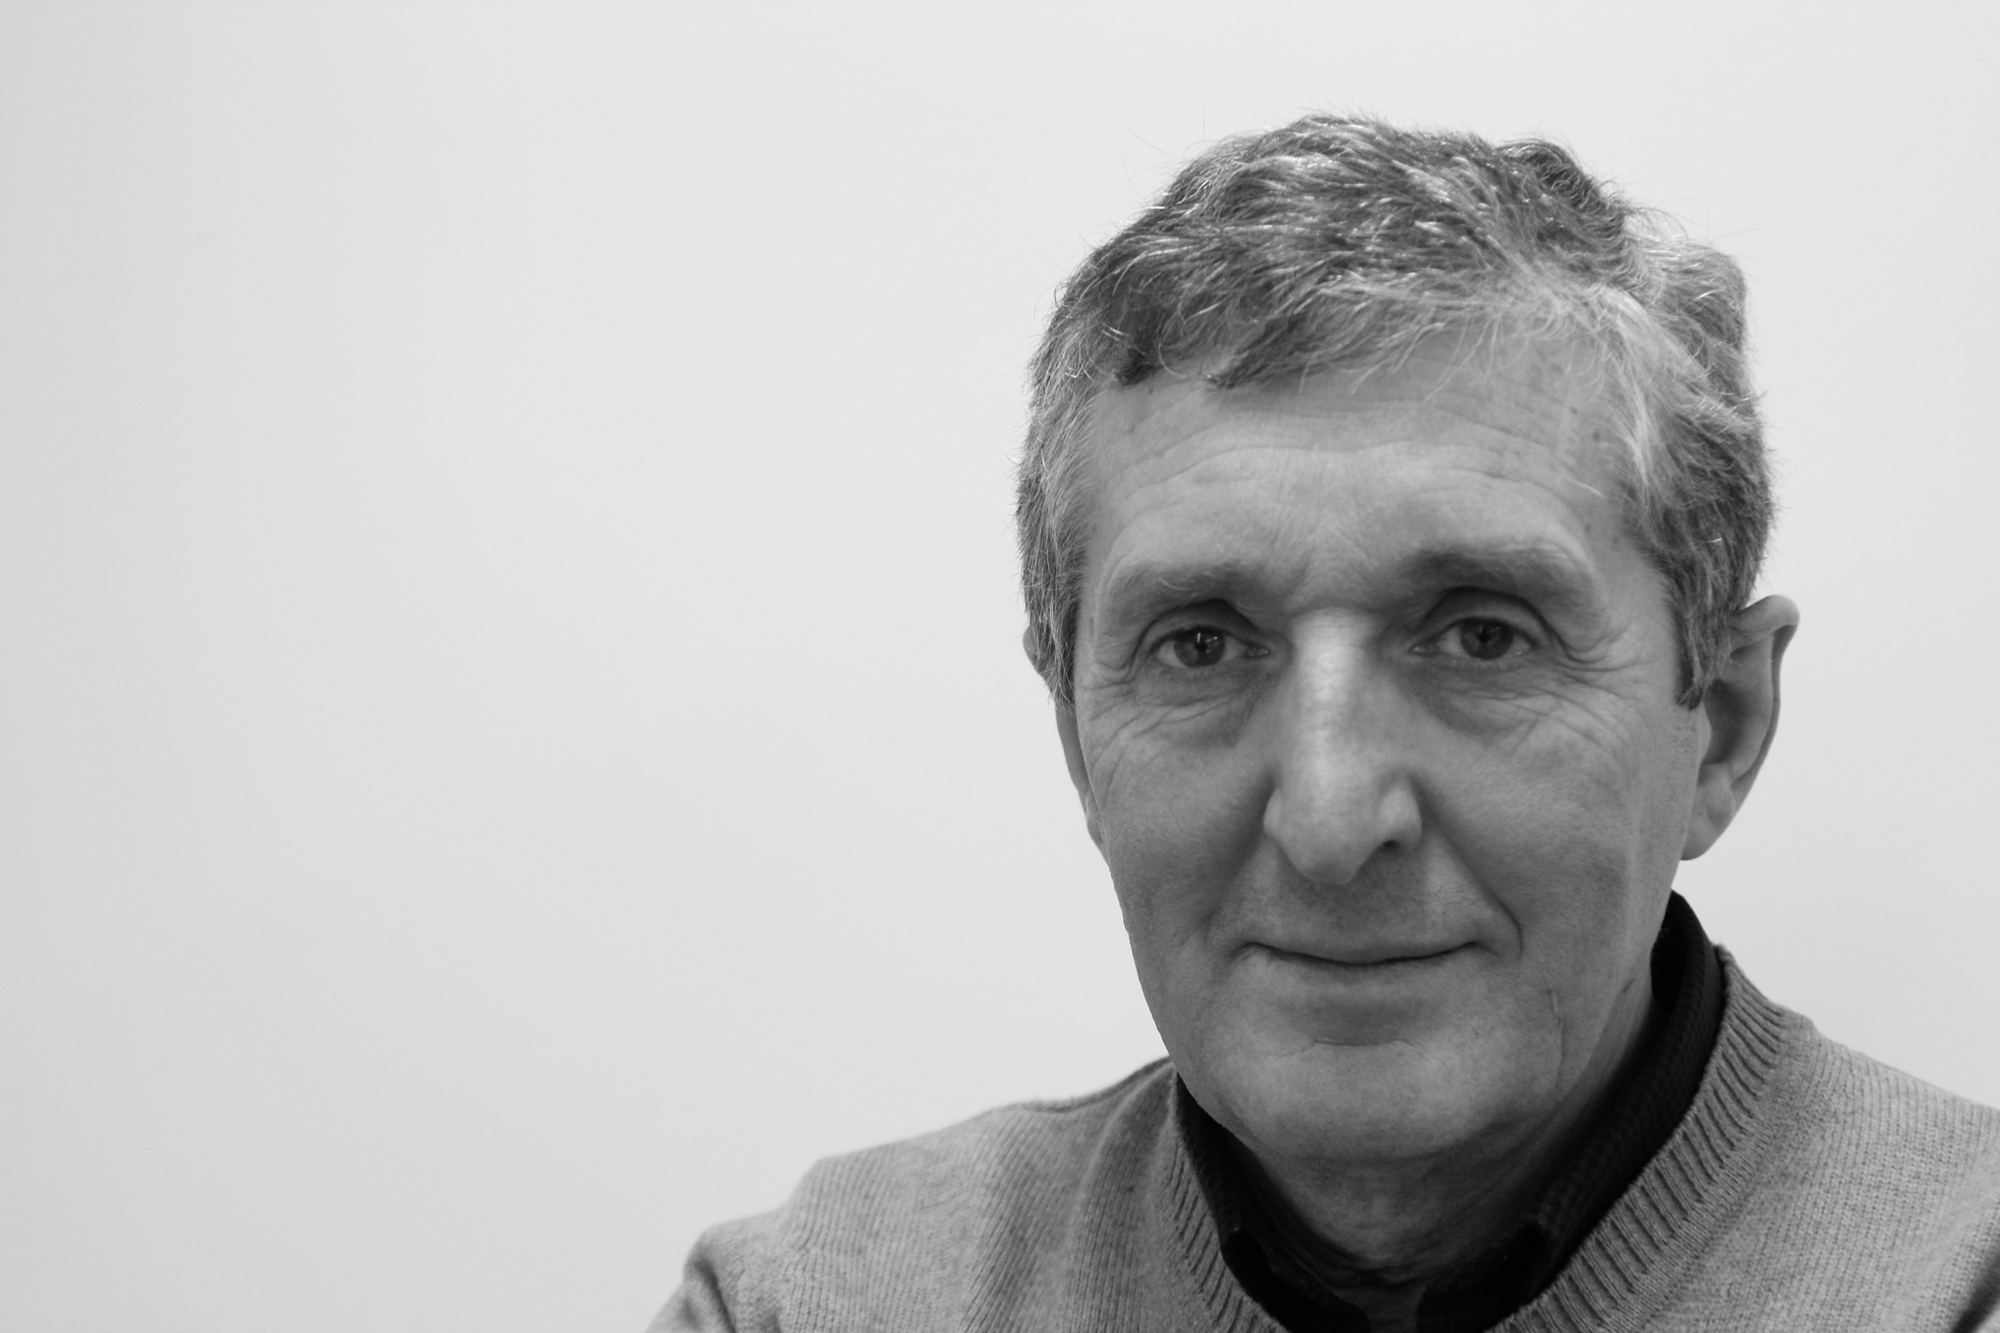 Jose Mari Esparza